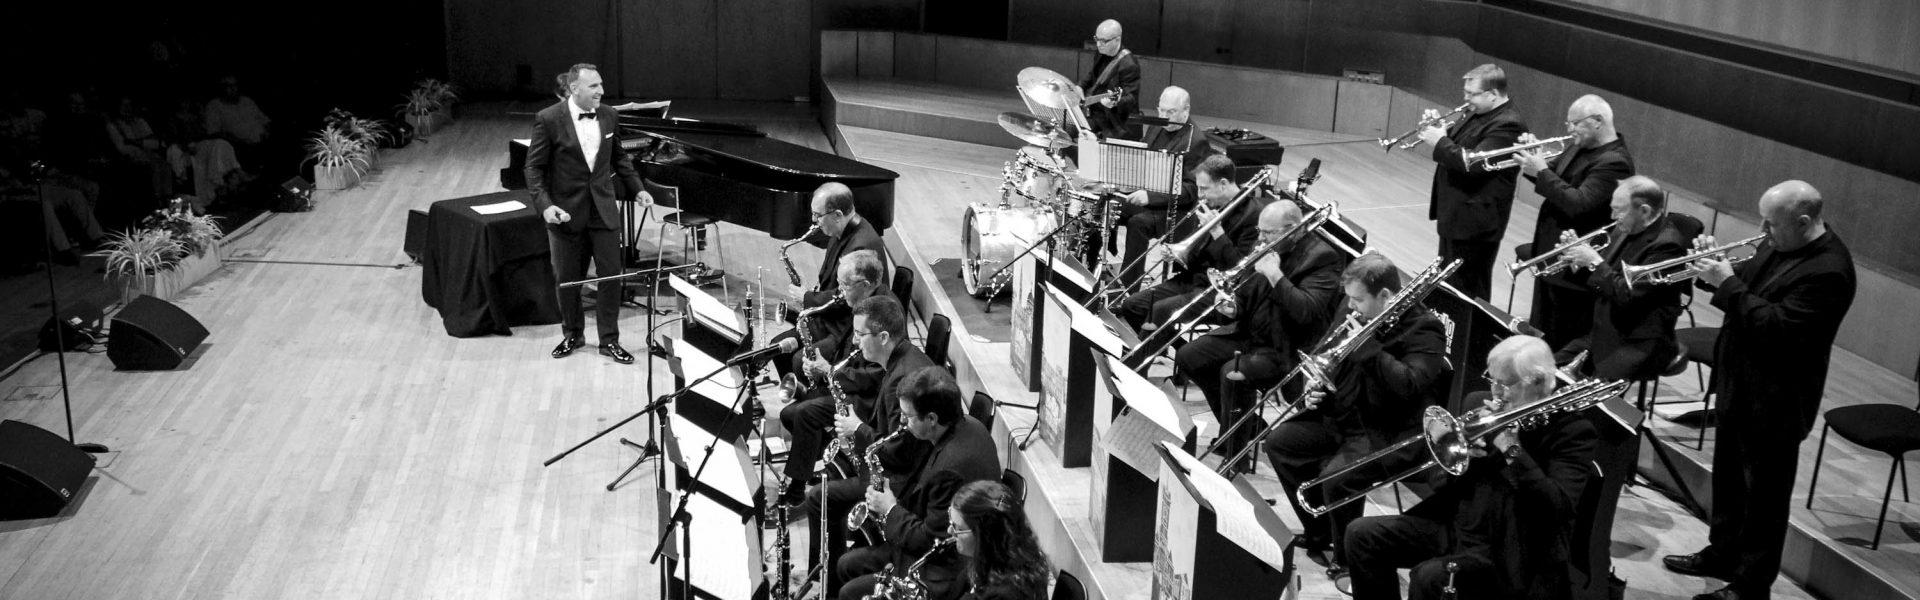 Brecon Jazz 2016